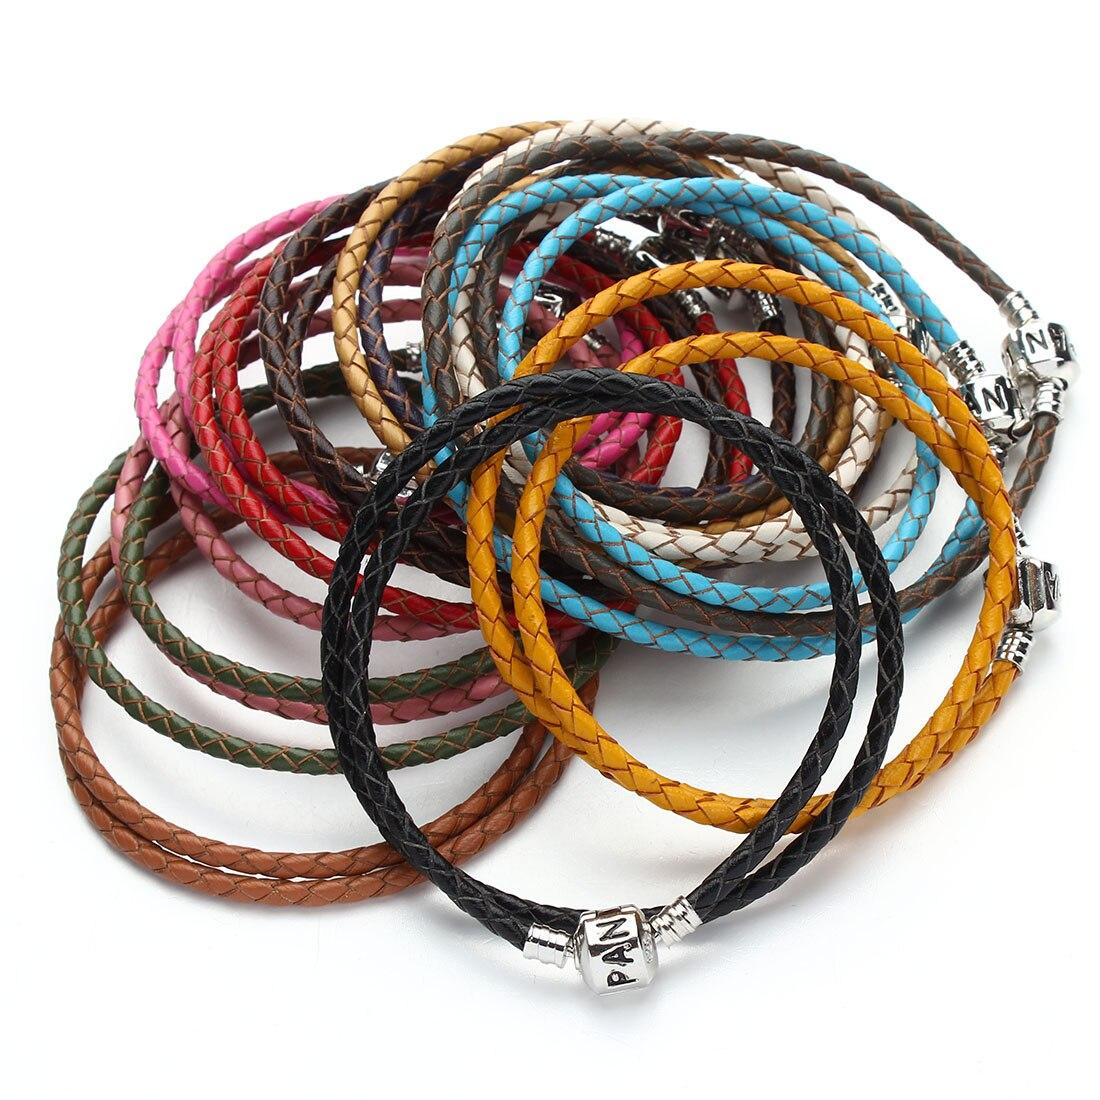 2020 New Fashion Double layer Braided Leather Bracelet Men Women Magnetic Clasps Charm Bracelets Pulseras Male Female Jewelry